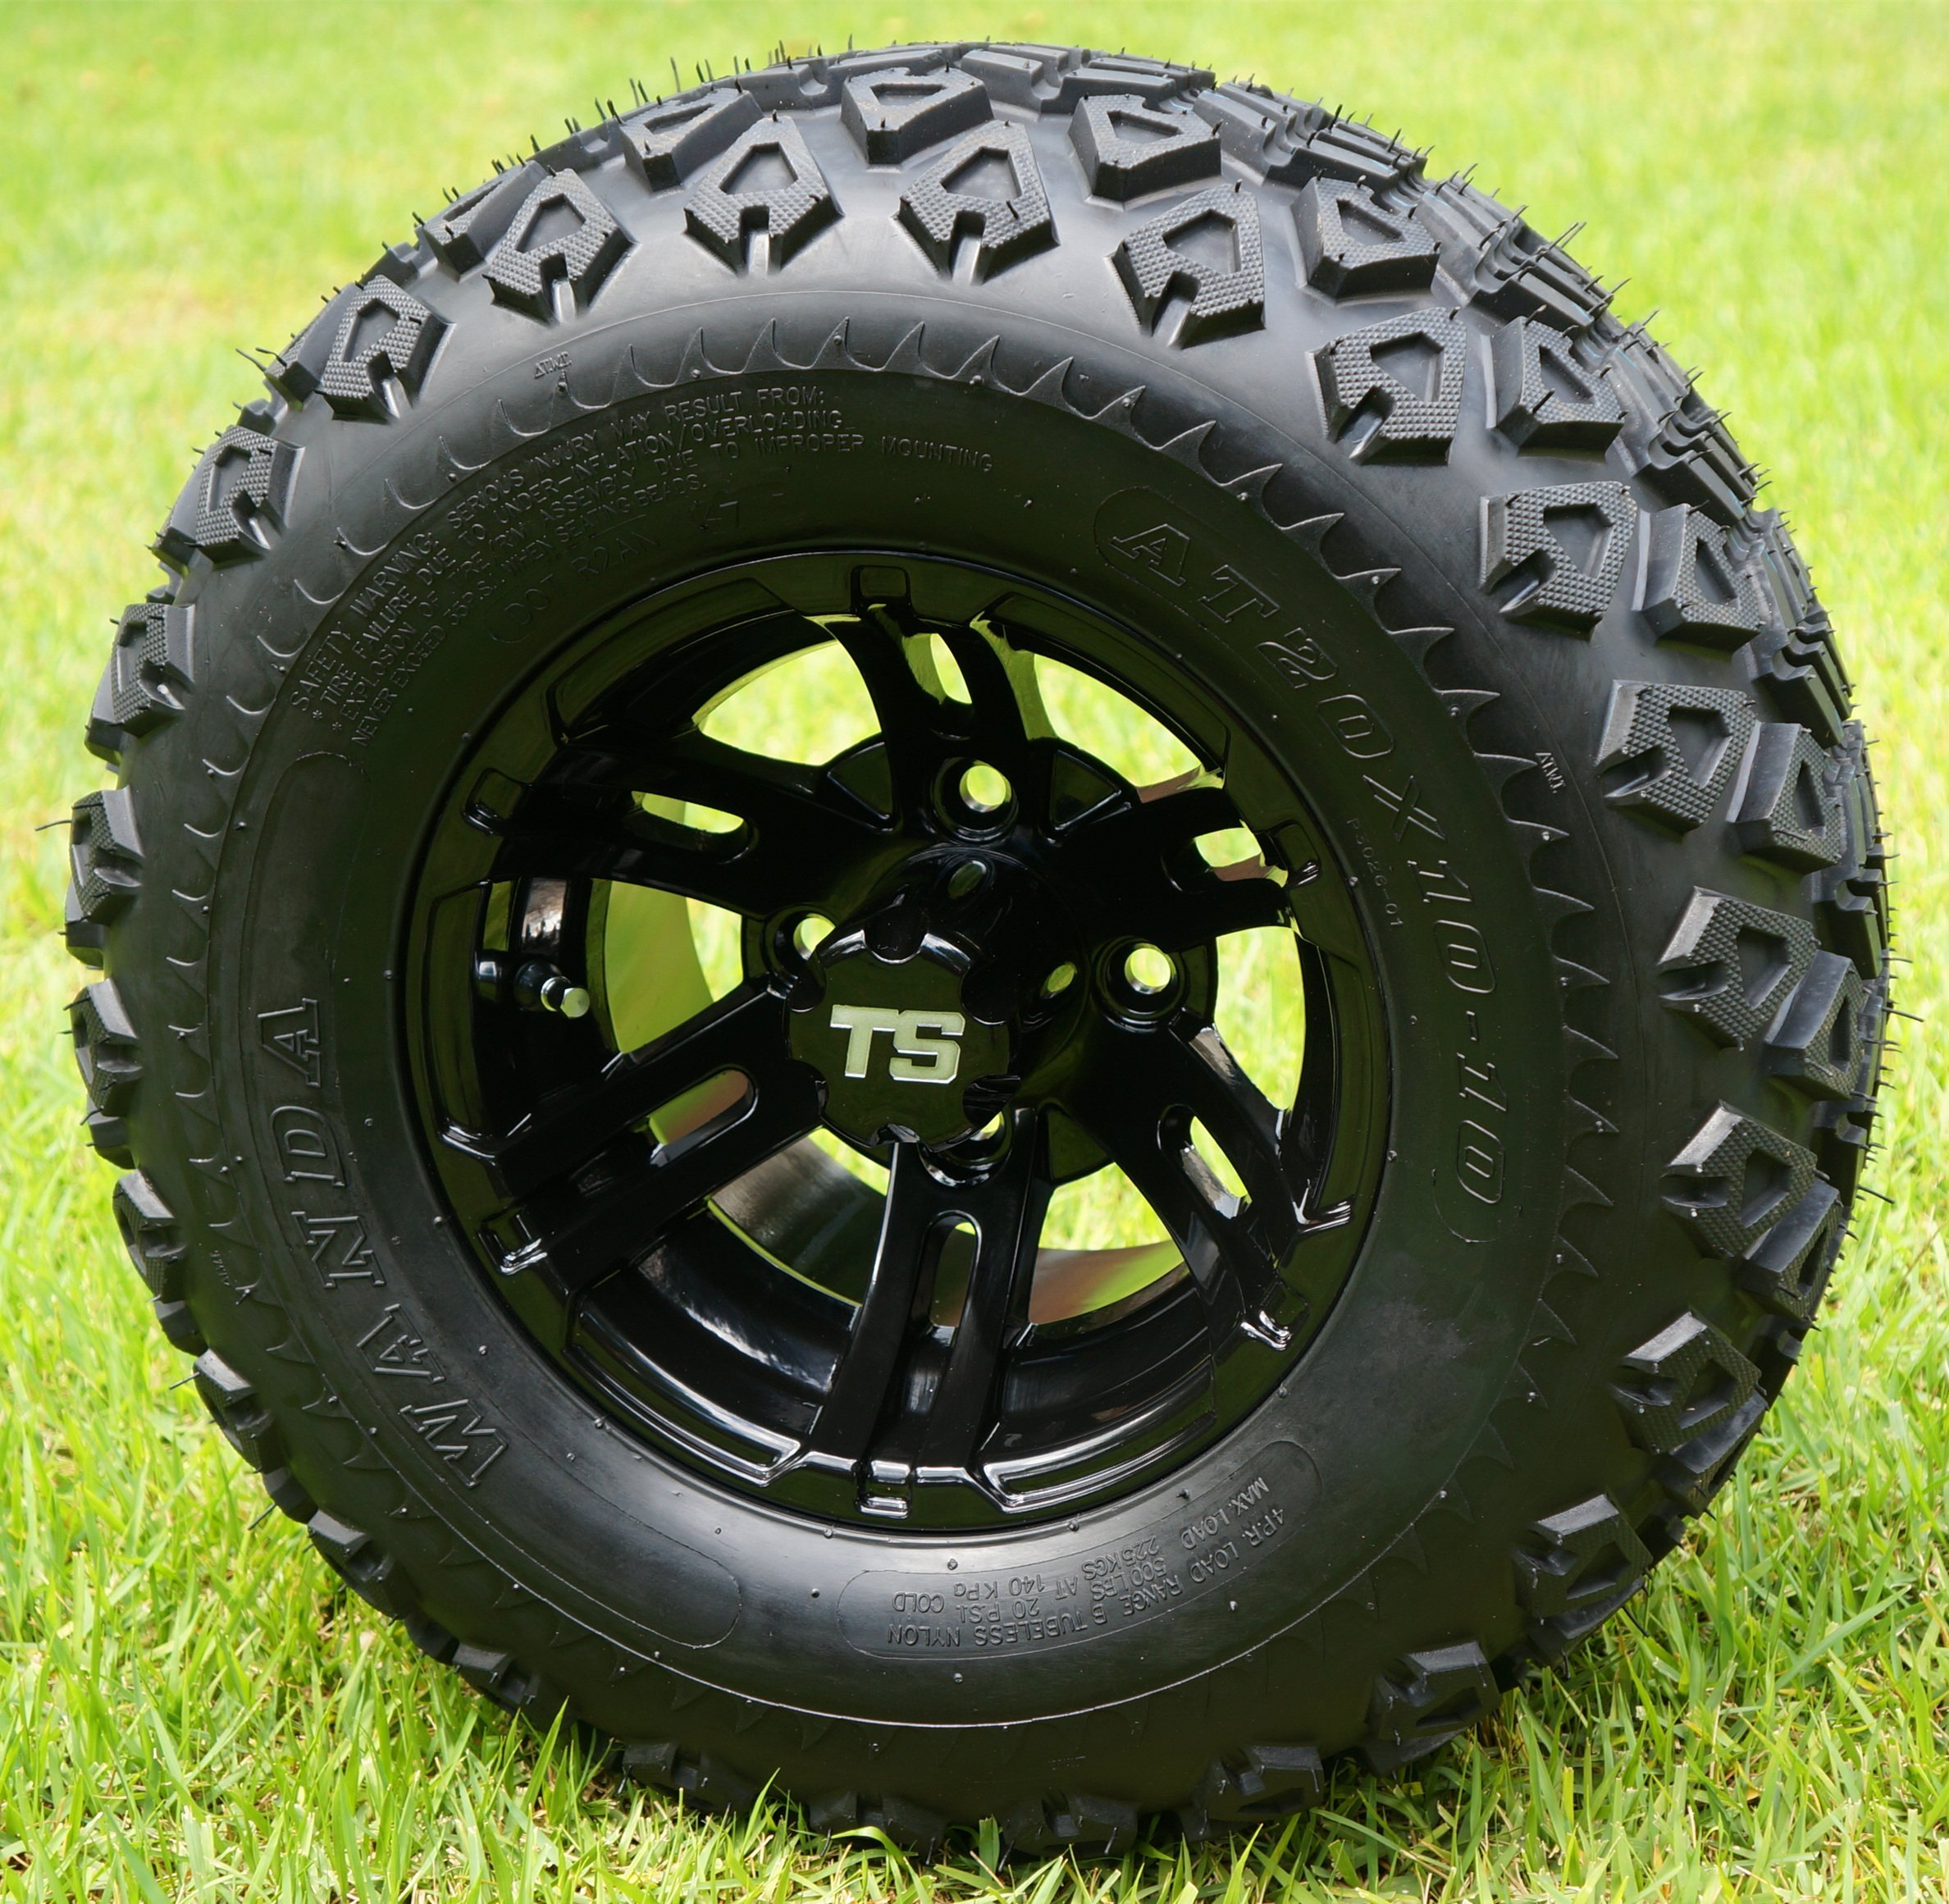 10'' BULLDOG Black Wheels and 20x10-10 DOT All Terrain Golf Cart Tires - Set of 4 by Golf Cart Tire Supply (Image #3)